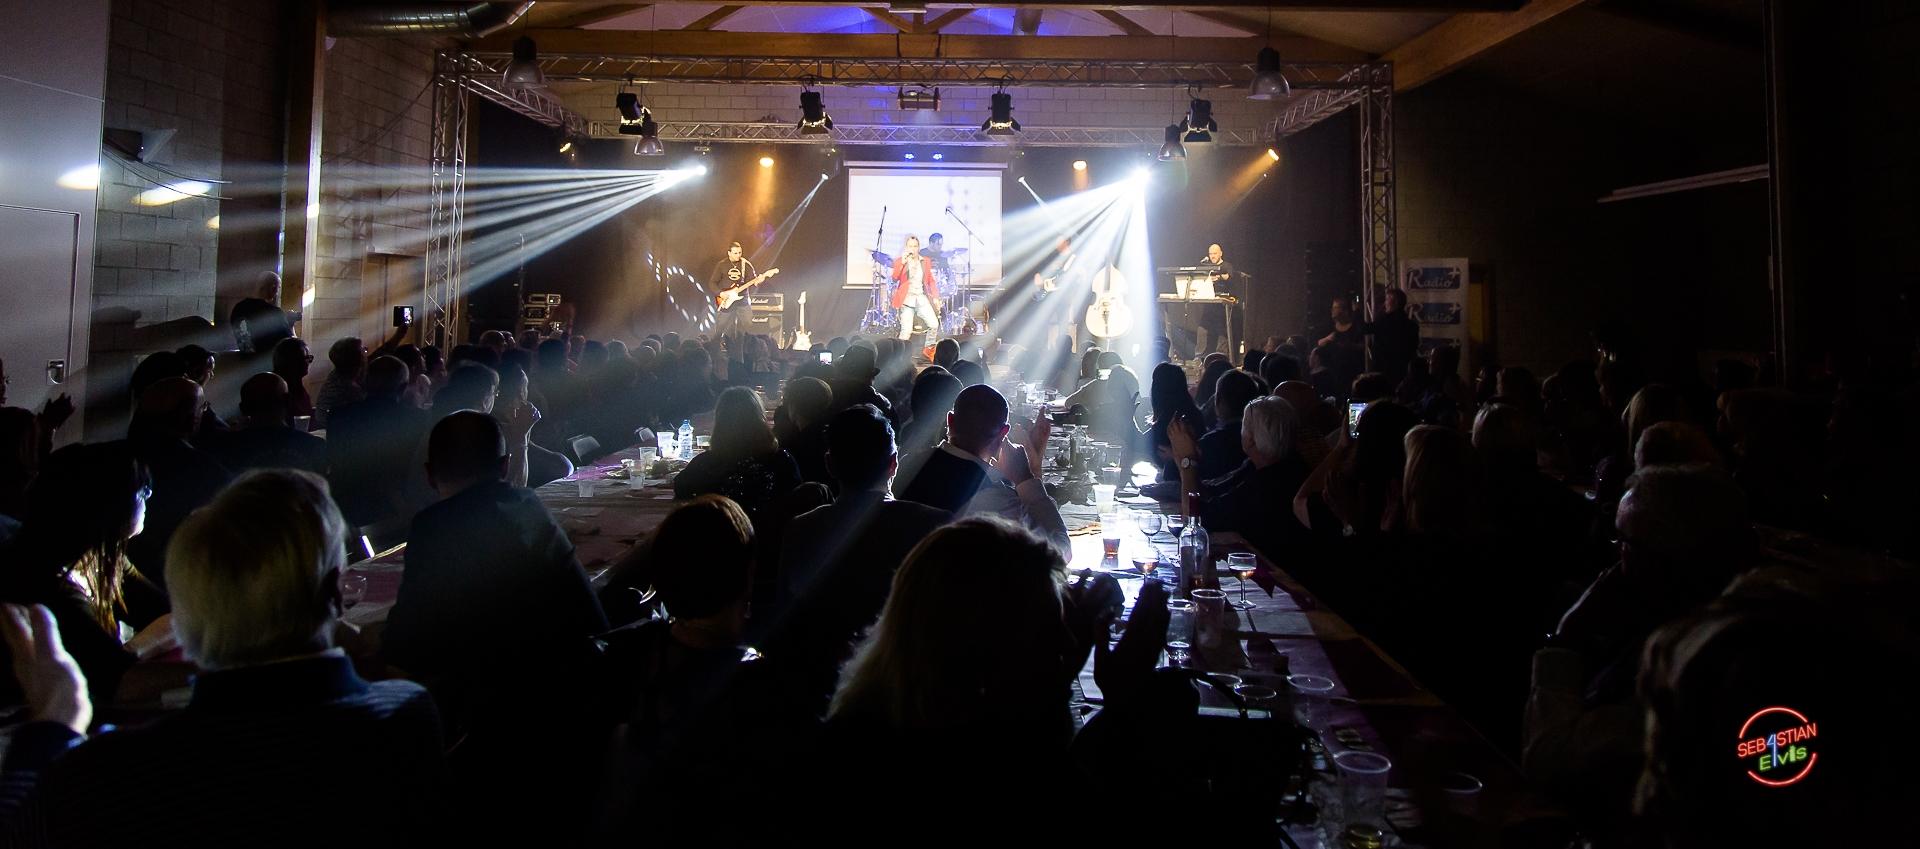 sebastian-for-elvis-pepone1307-centre-culturel-rocourt-facebook-53